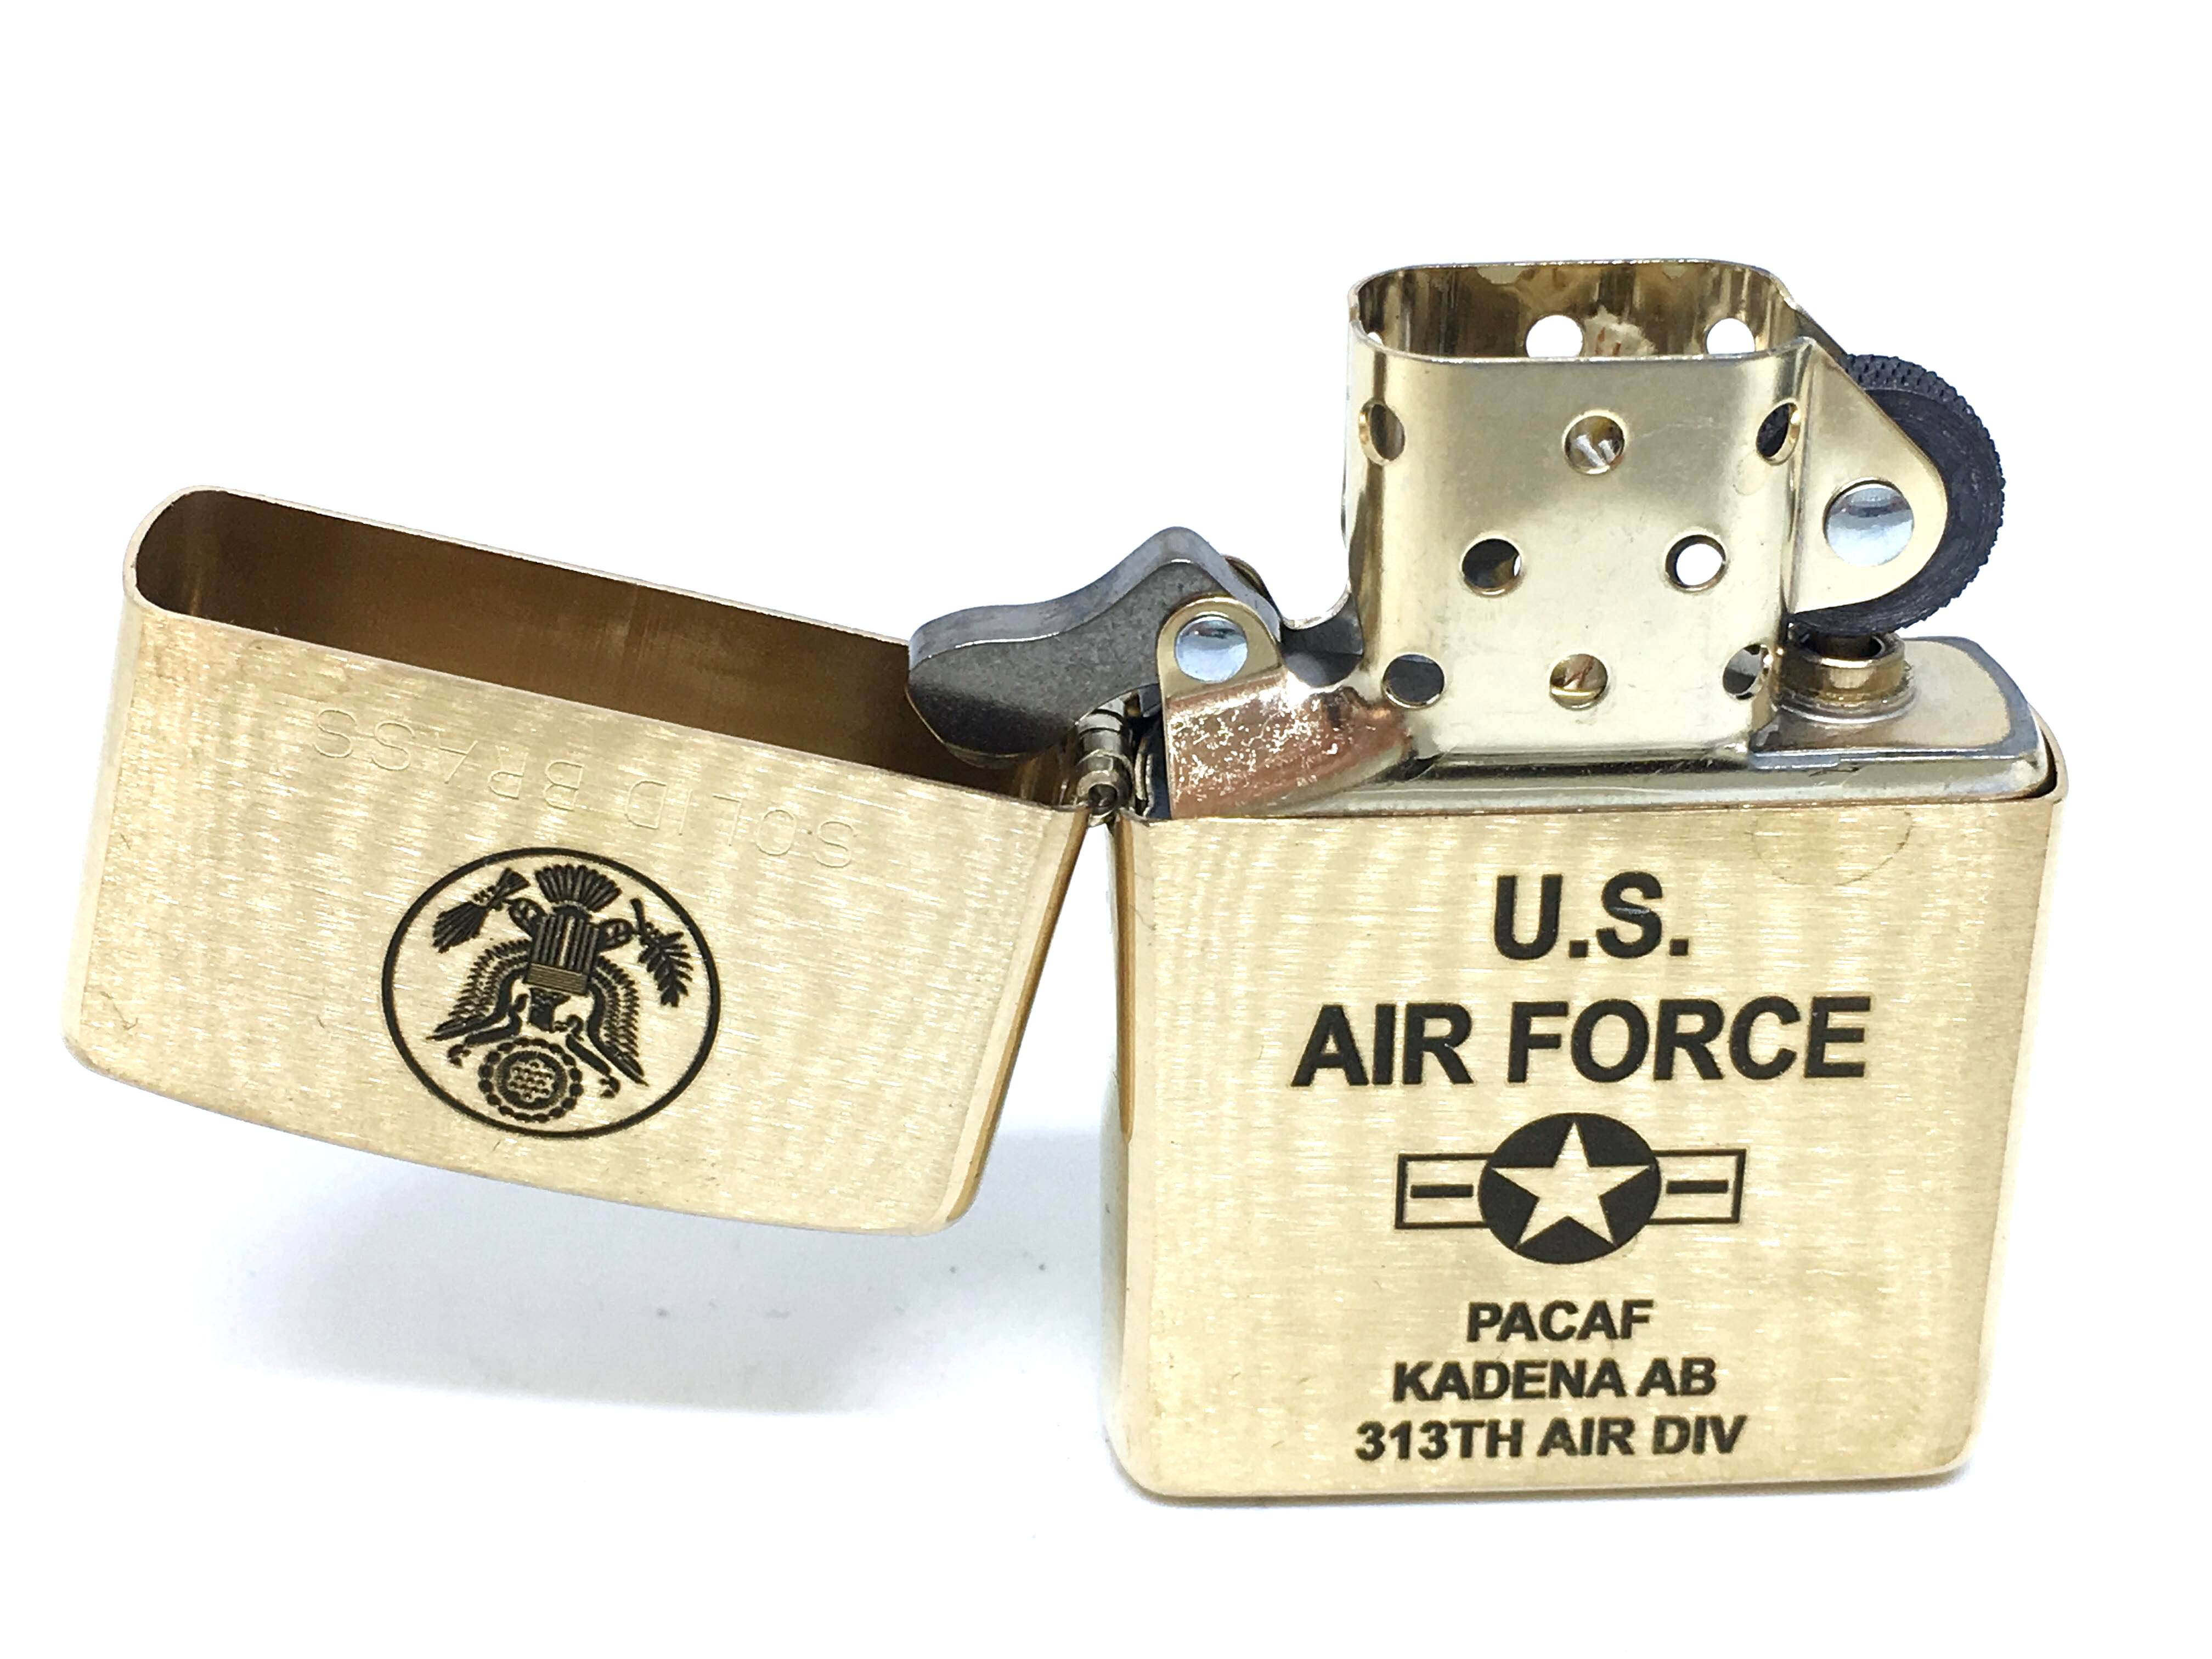 Zippo vang nham khac laze U.S.AIR FORCE NTZ708 3